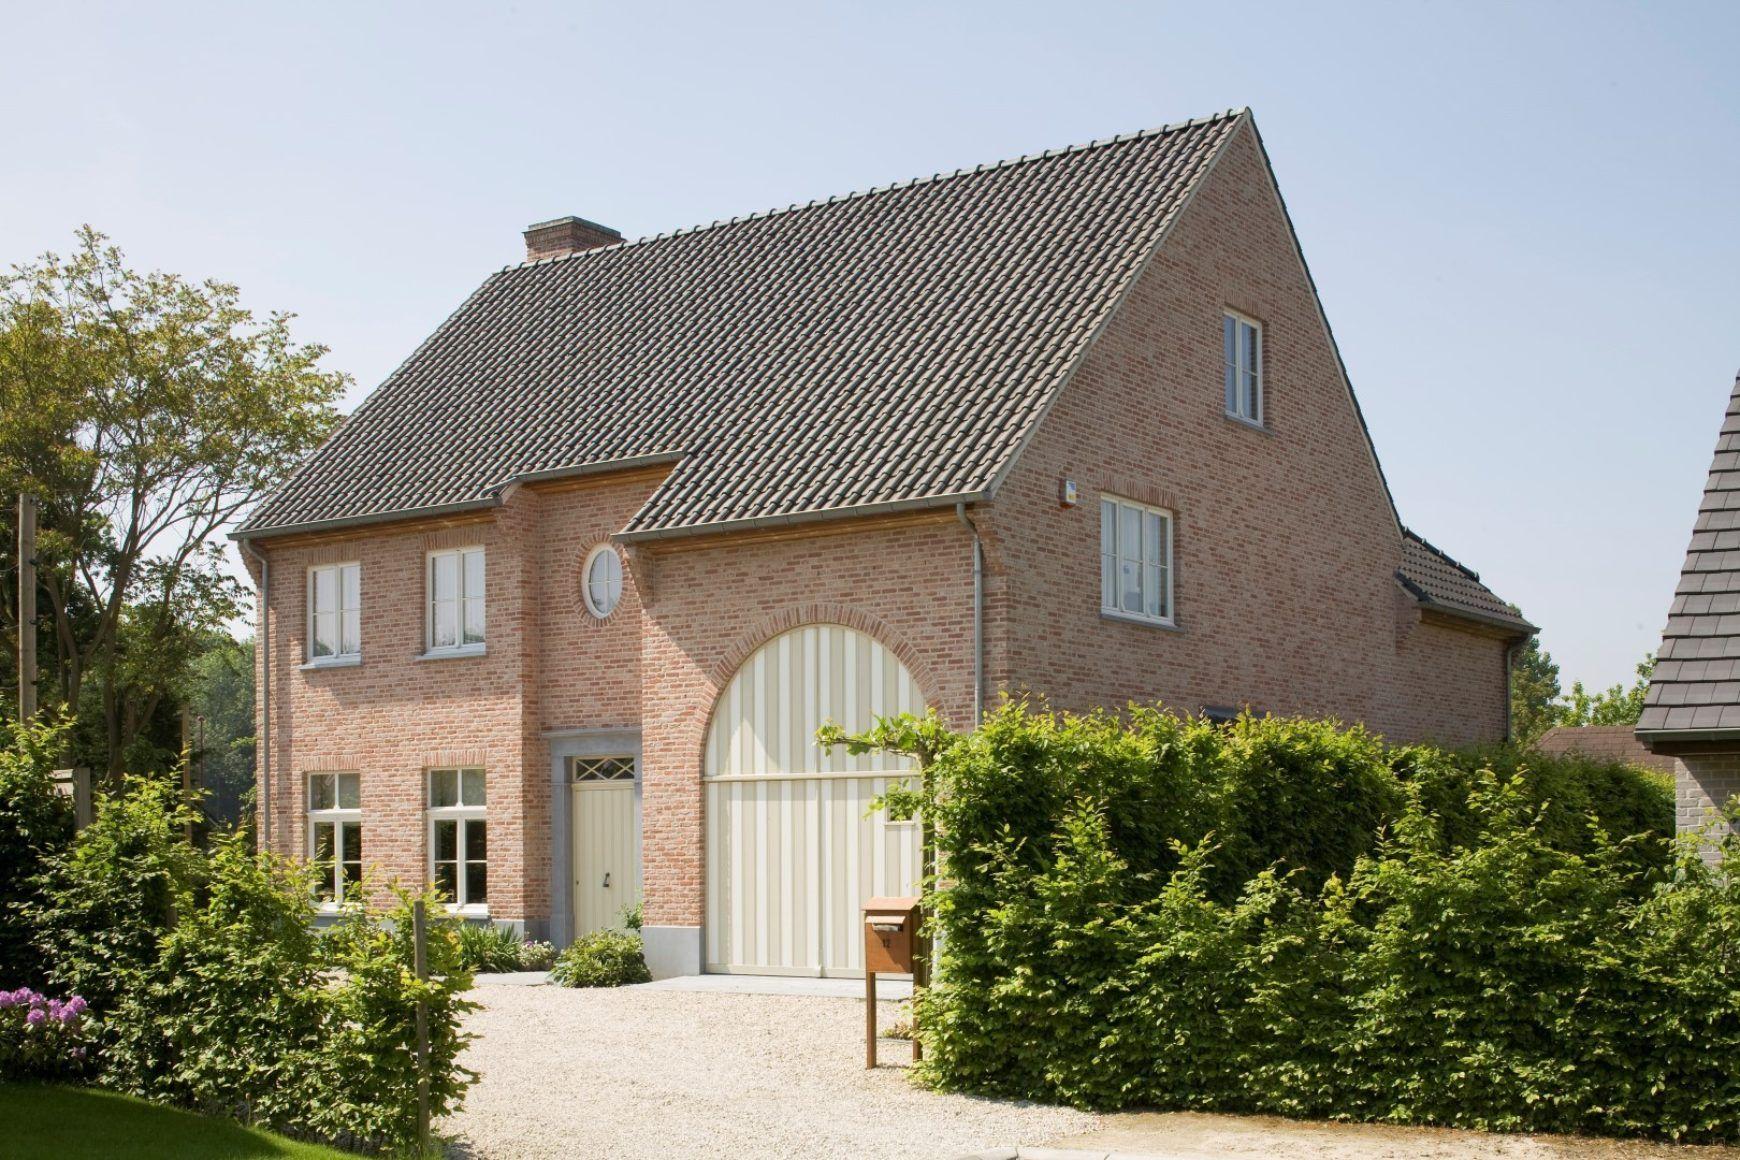 Koop hier je landelijke woning of huis op maat huysman for Landelijke woning